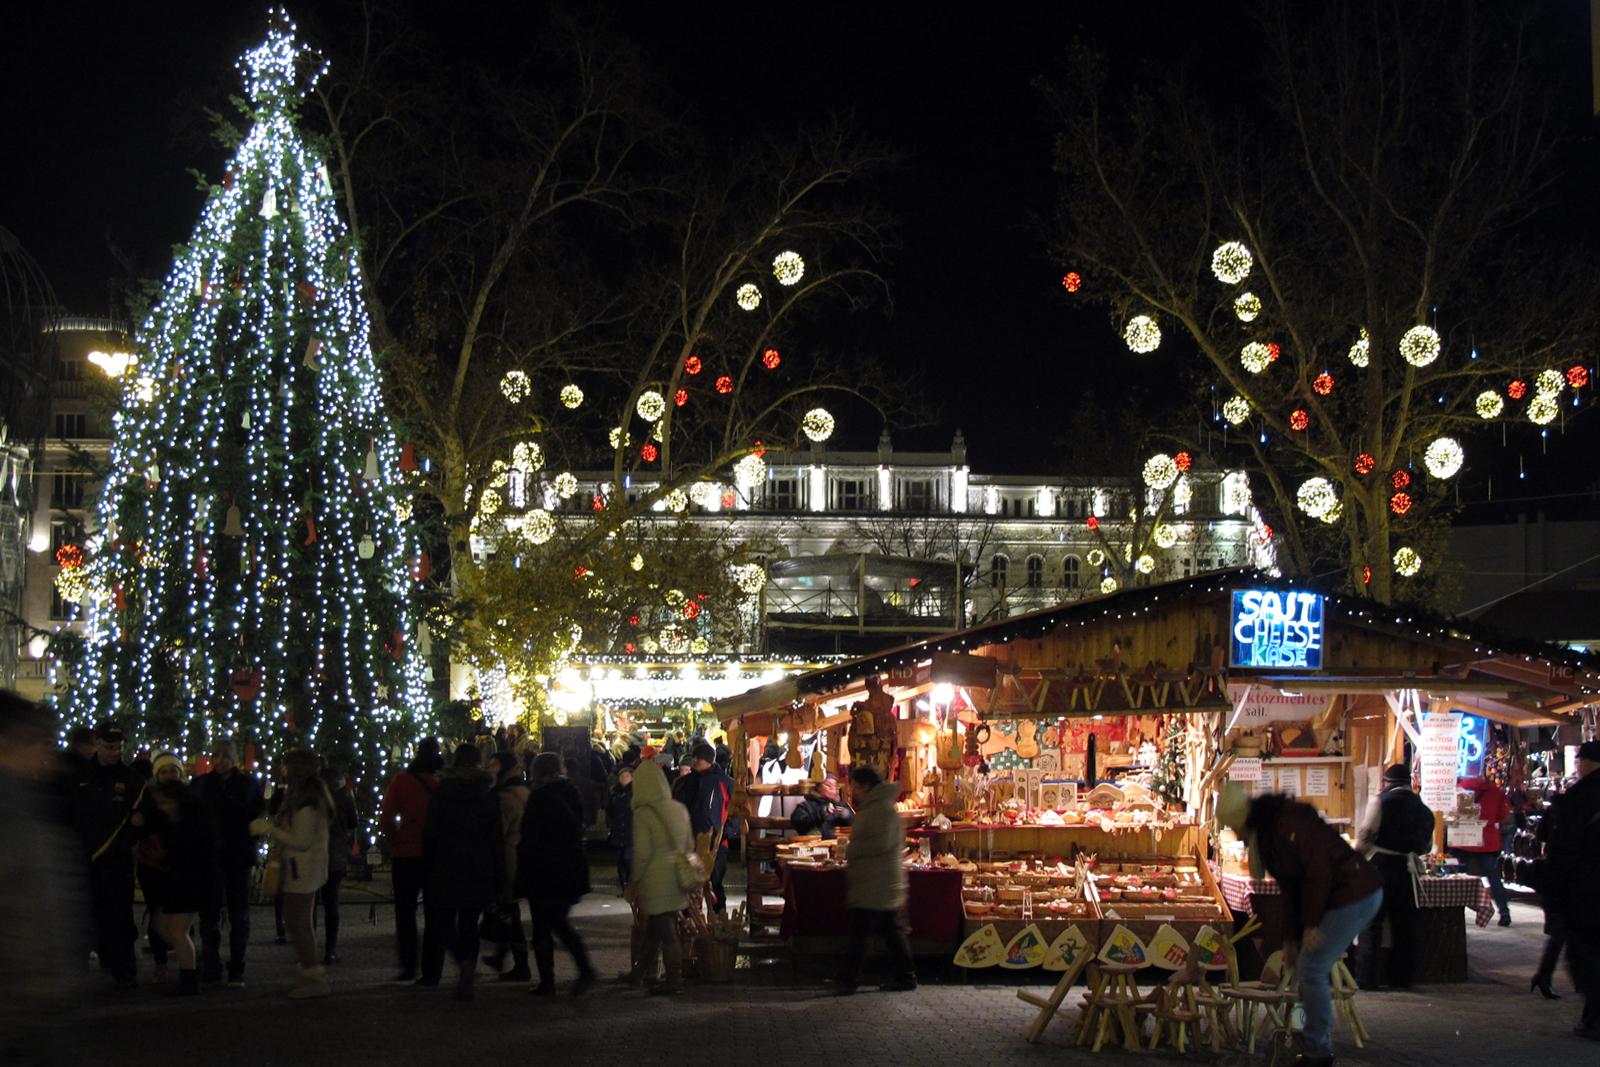 mercatini di natale budapest 2019 date 1